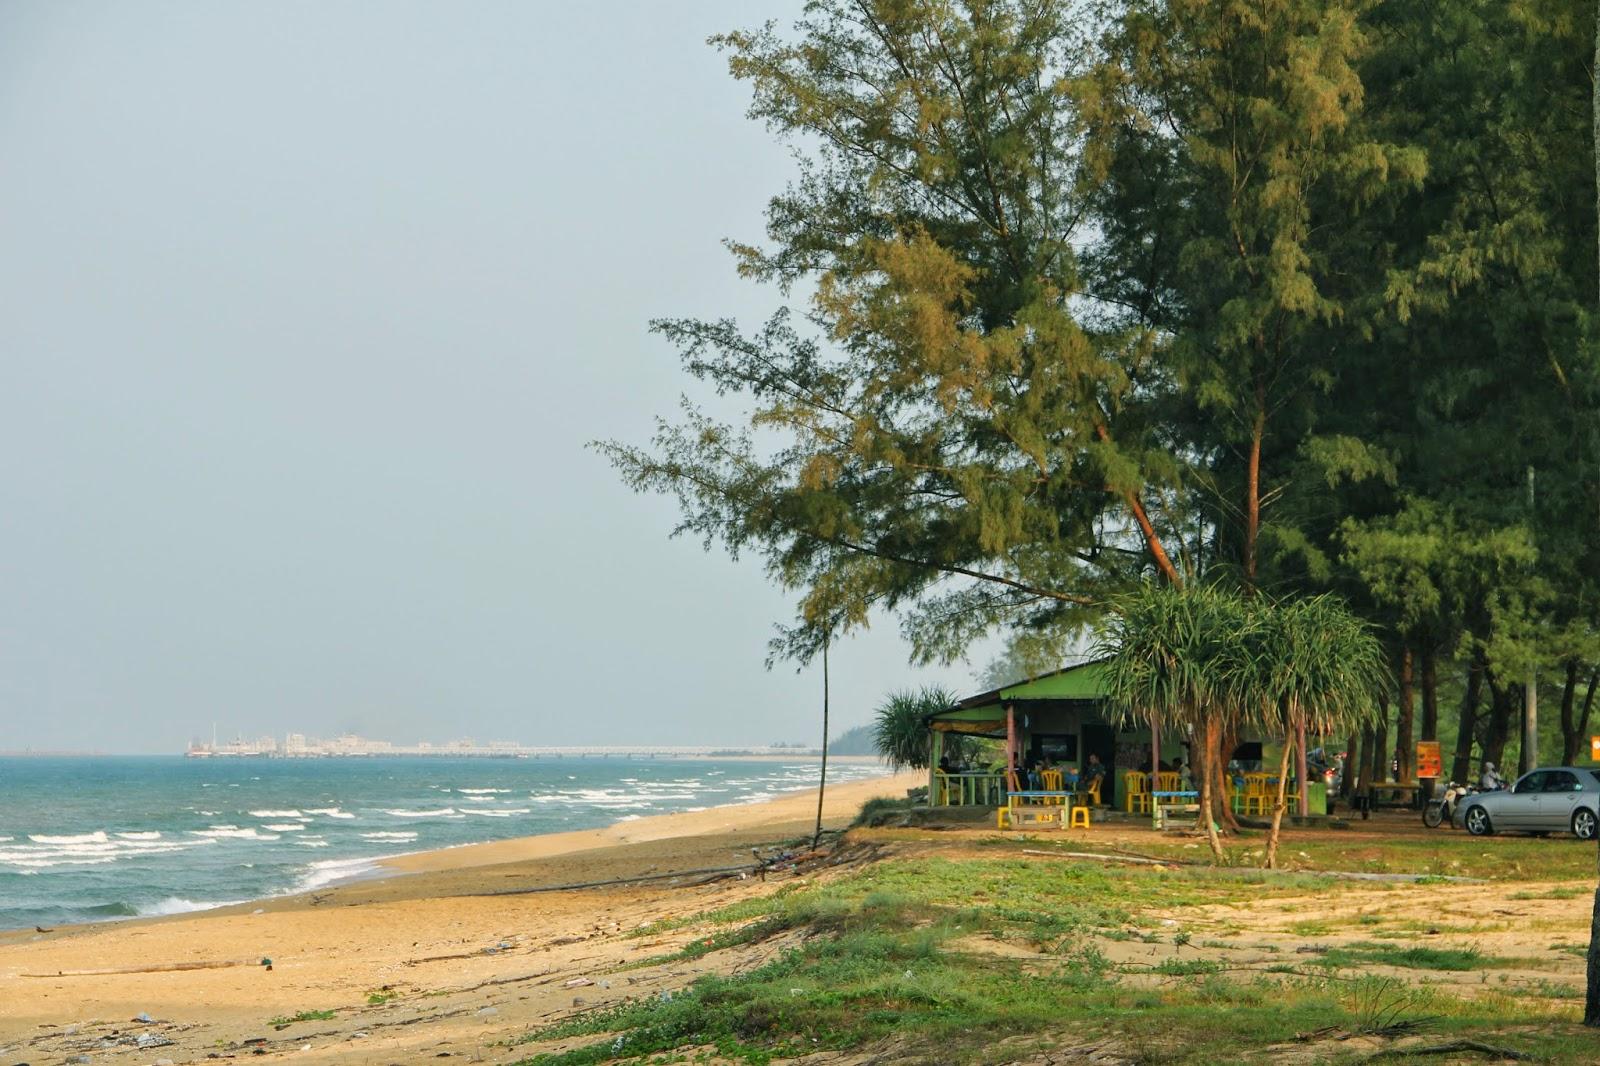 IMG_9611 Of Pantai Paka Di Terengganu Tempat Menarik Yang Memukau Untuk Tenangkan Fikiran